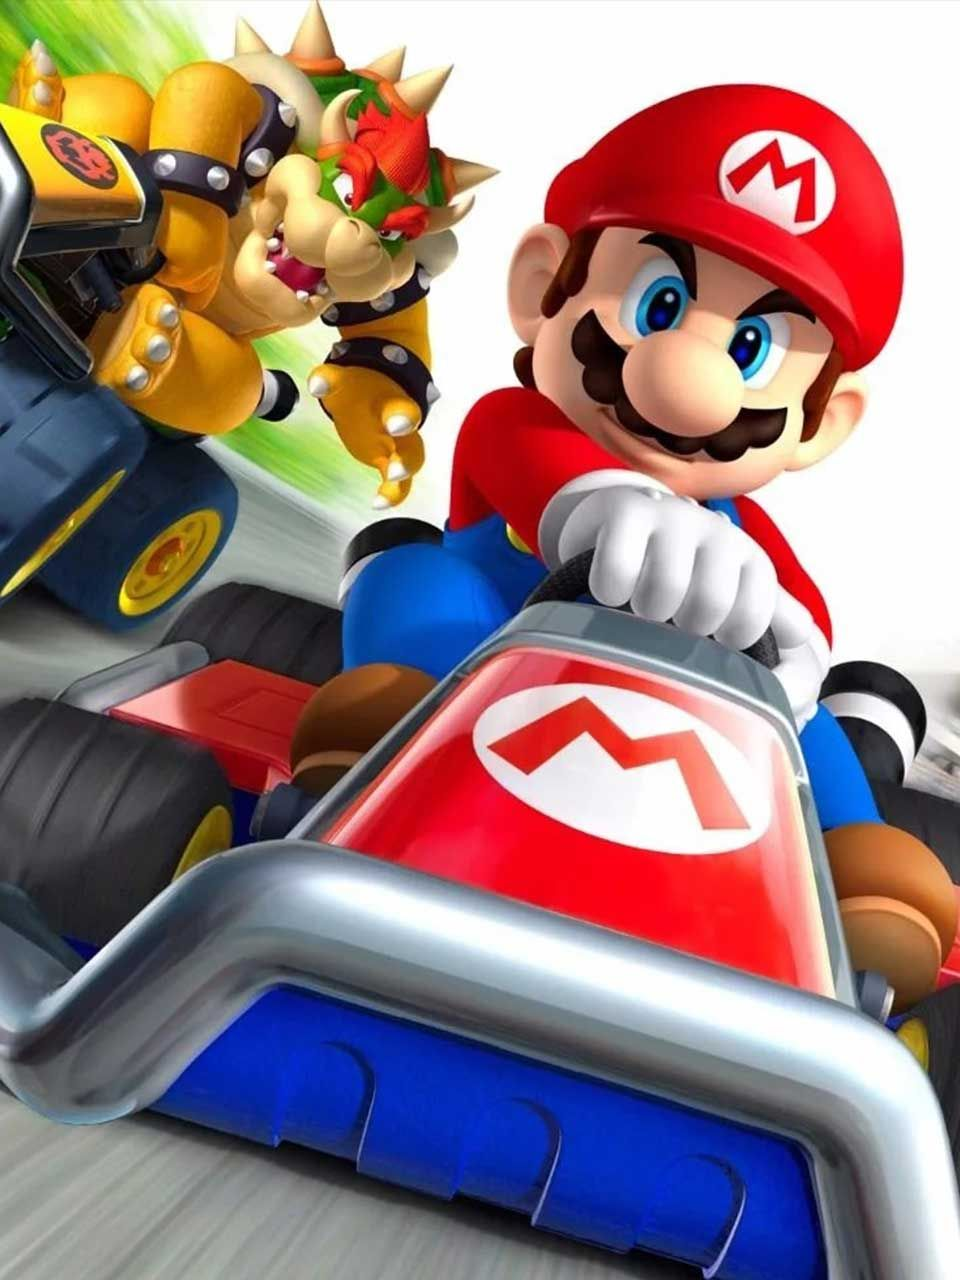 100 Working Mario Kart Tour Hack Mario Kart Tour Coins And Ruby Cheats Mario Kart Tour Hack And Cheats Mario Kart To Mario Kart Game Cheats Racing Games